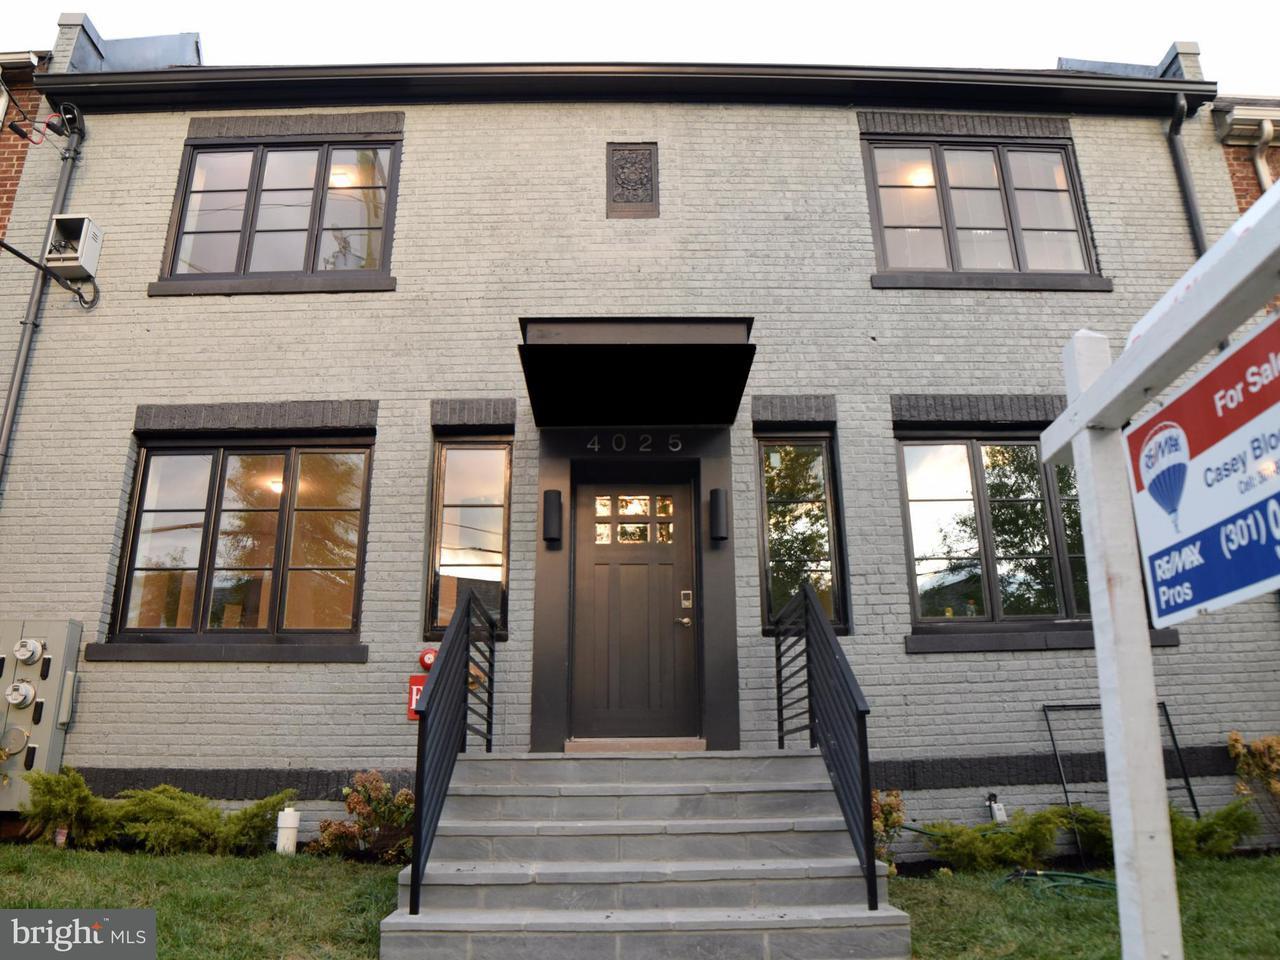 Casa unifamiliar adosada (Townhouse) por un Venta en 4025 7TH ST NE #1 4025 7TH ST NE #1 Washington, Distrito De Columbia 20017 Estados Unidos